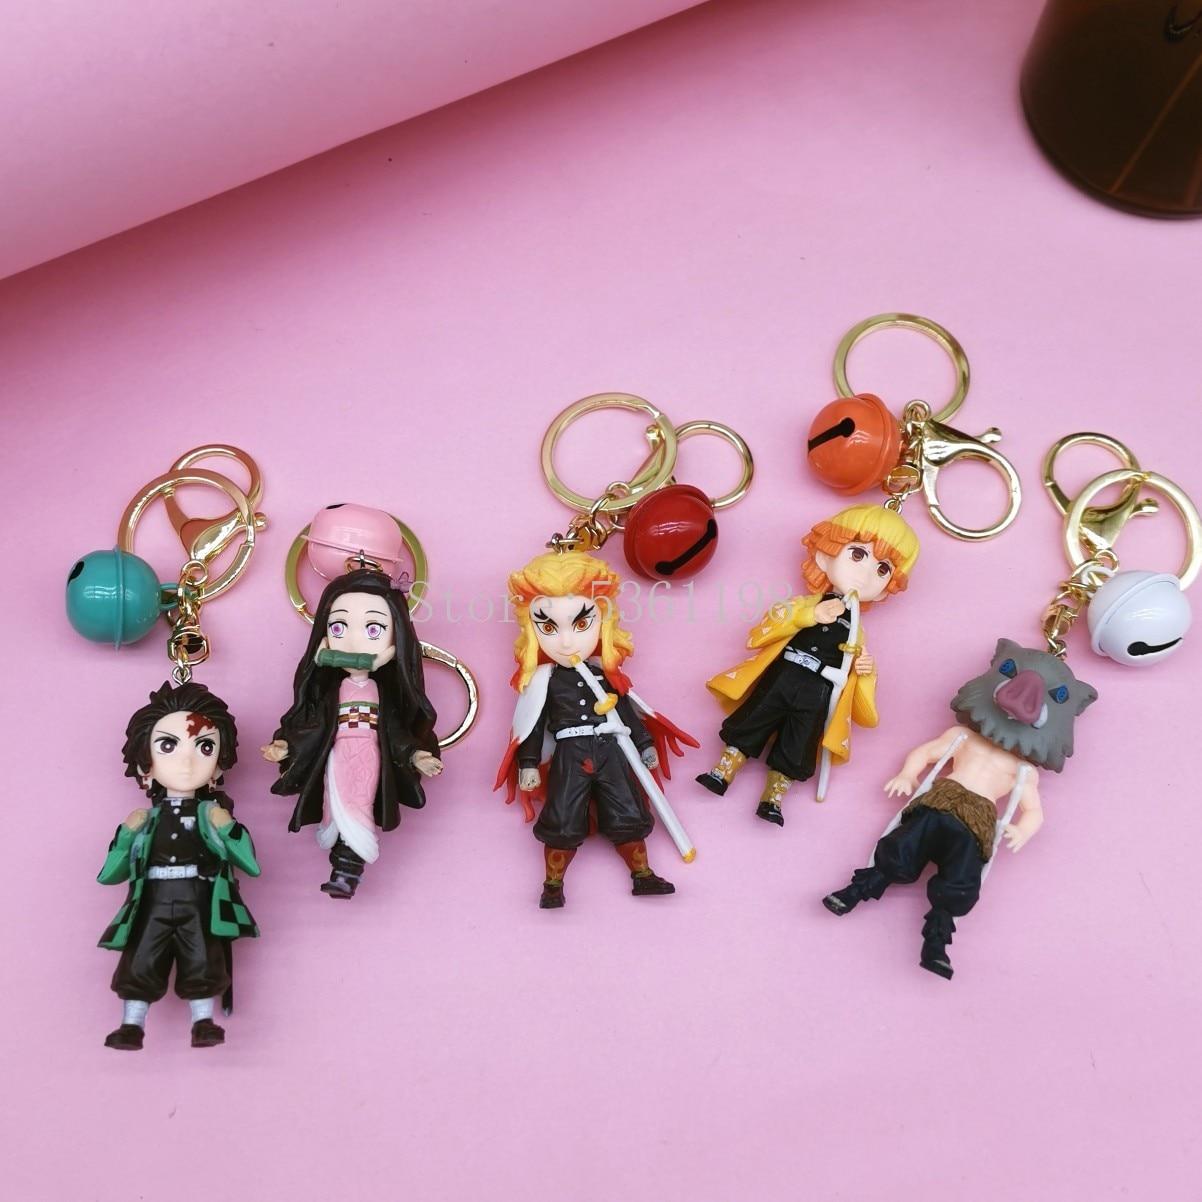 57cm Kimetsu no Yaiba Anime Figure Kamado Tanjirou Kamado Nezuko PVC Anime Figure Toy Demon Slayer Collection Model Doll